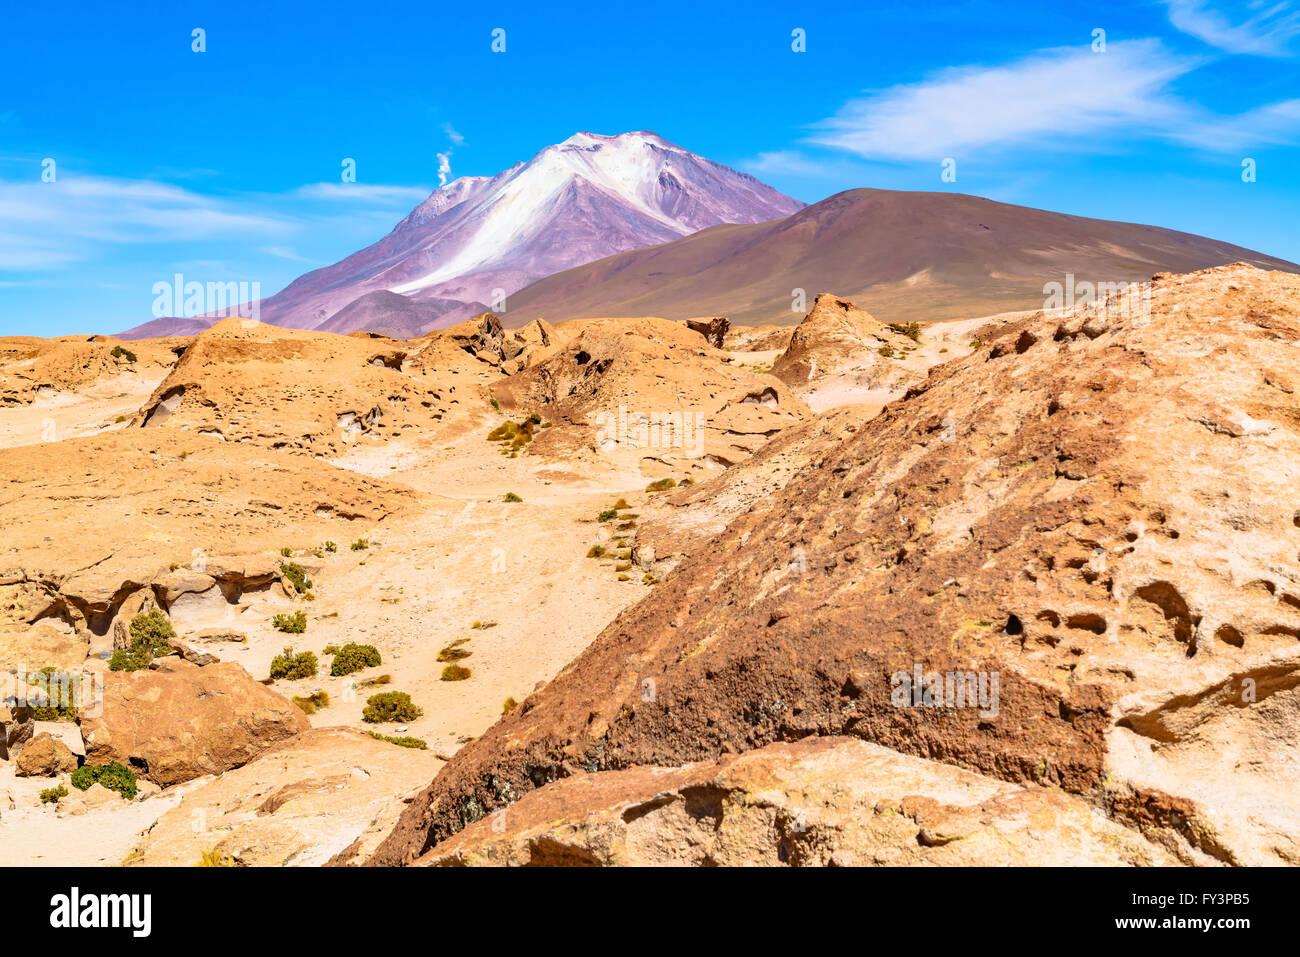 Active volcano with the smoke in Uyuni Bolivia - Stock Image